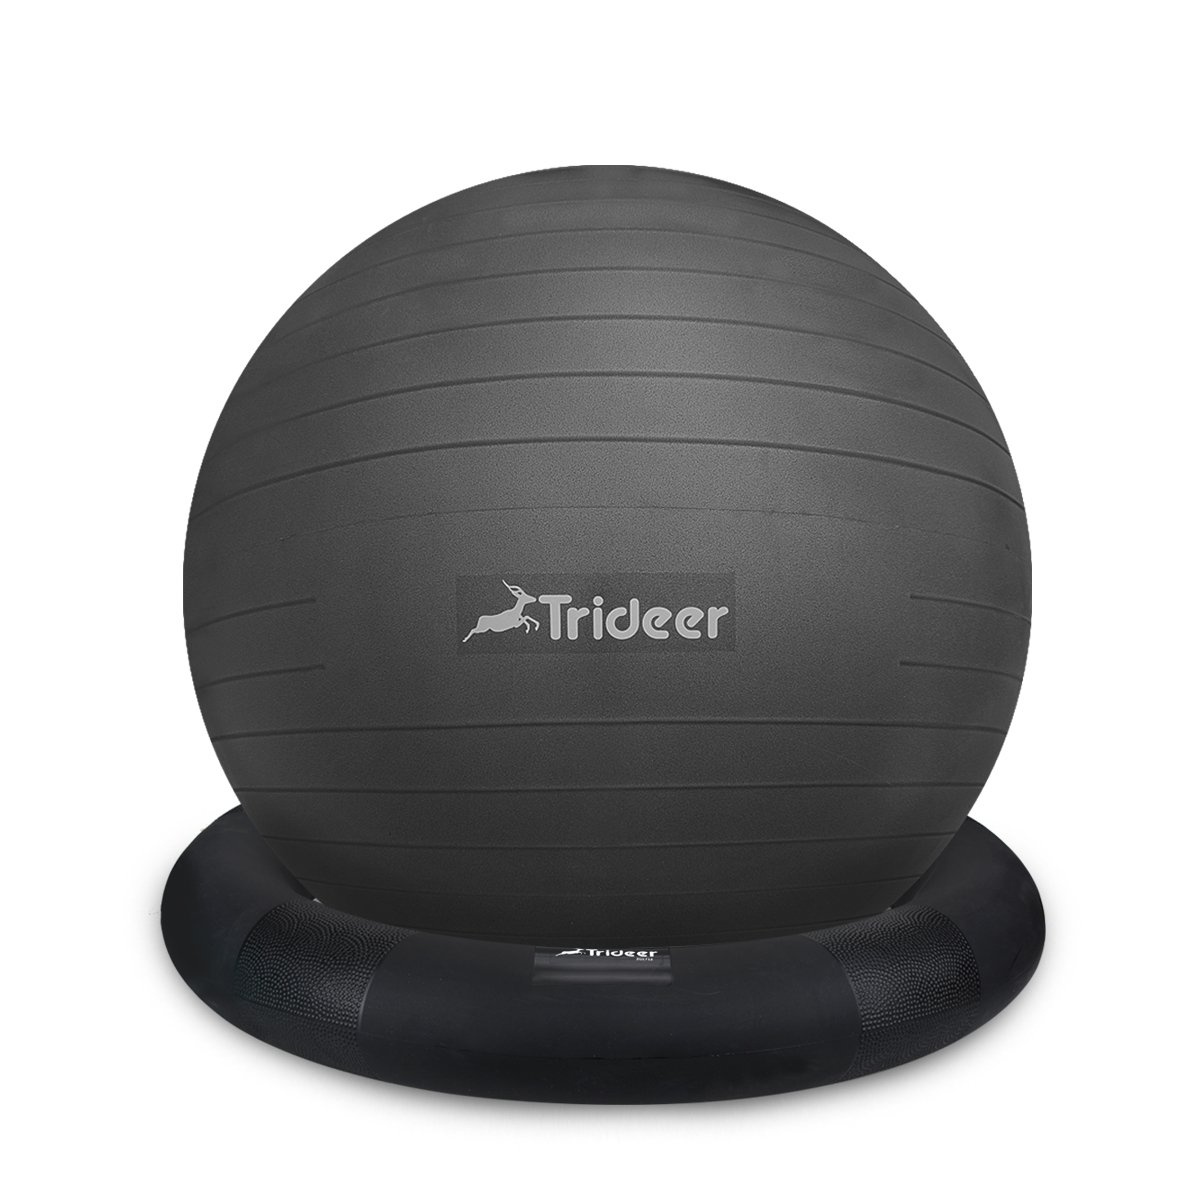 trideer 65 cmボール椅子柔軟なSeating Exerciseヨガバランスのボールと安定性向上のためのリング&ポンプ、Greatバランス&コア強度 B07CMC8C7H B07CMC8C7H Ball with with New Ball Ring (Black) 65cm 65cm|Ball with New Ring (Black), MALIBU WIG SHOP:e8c5c5f3 --- sodern.se